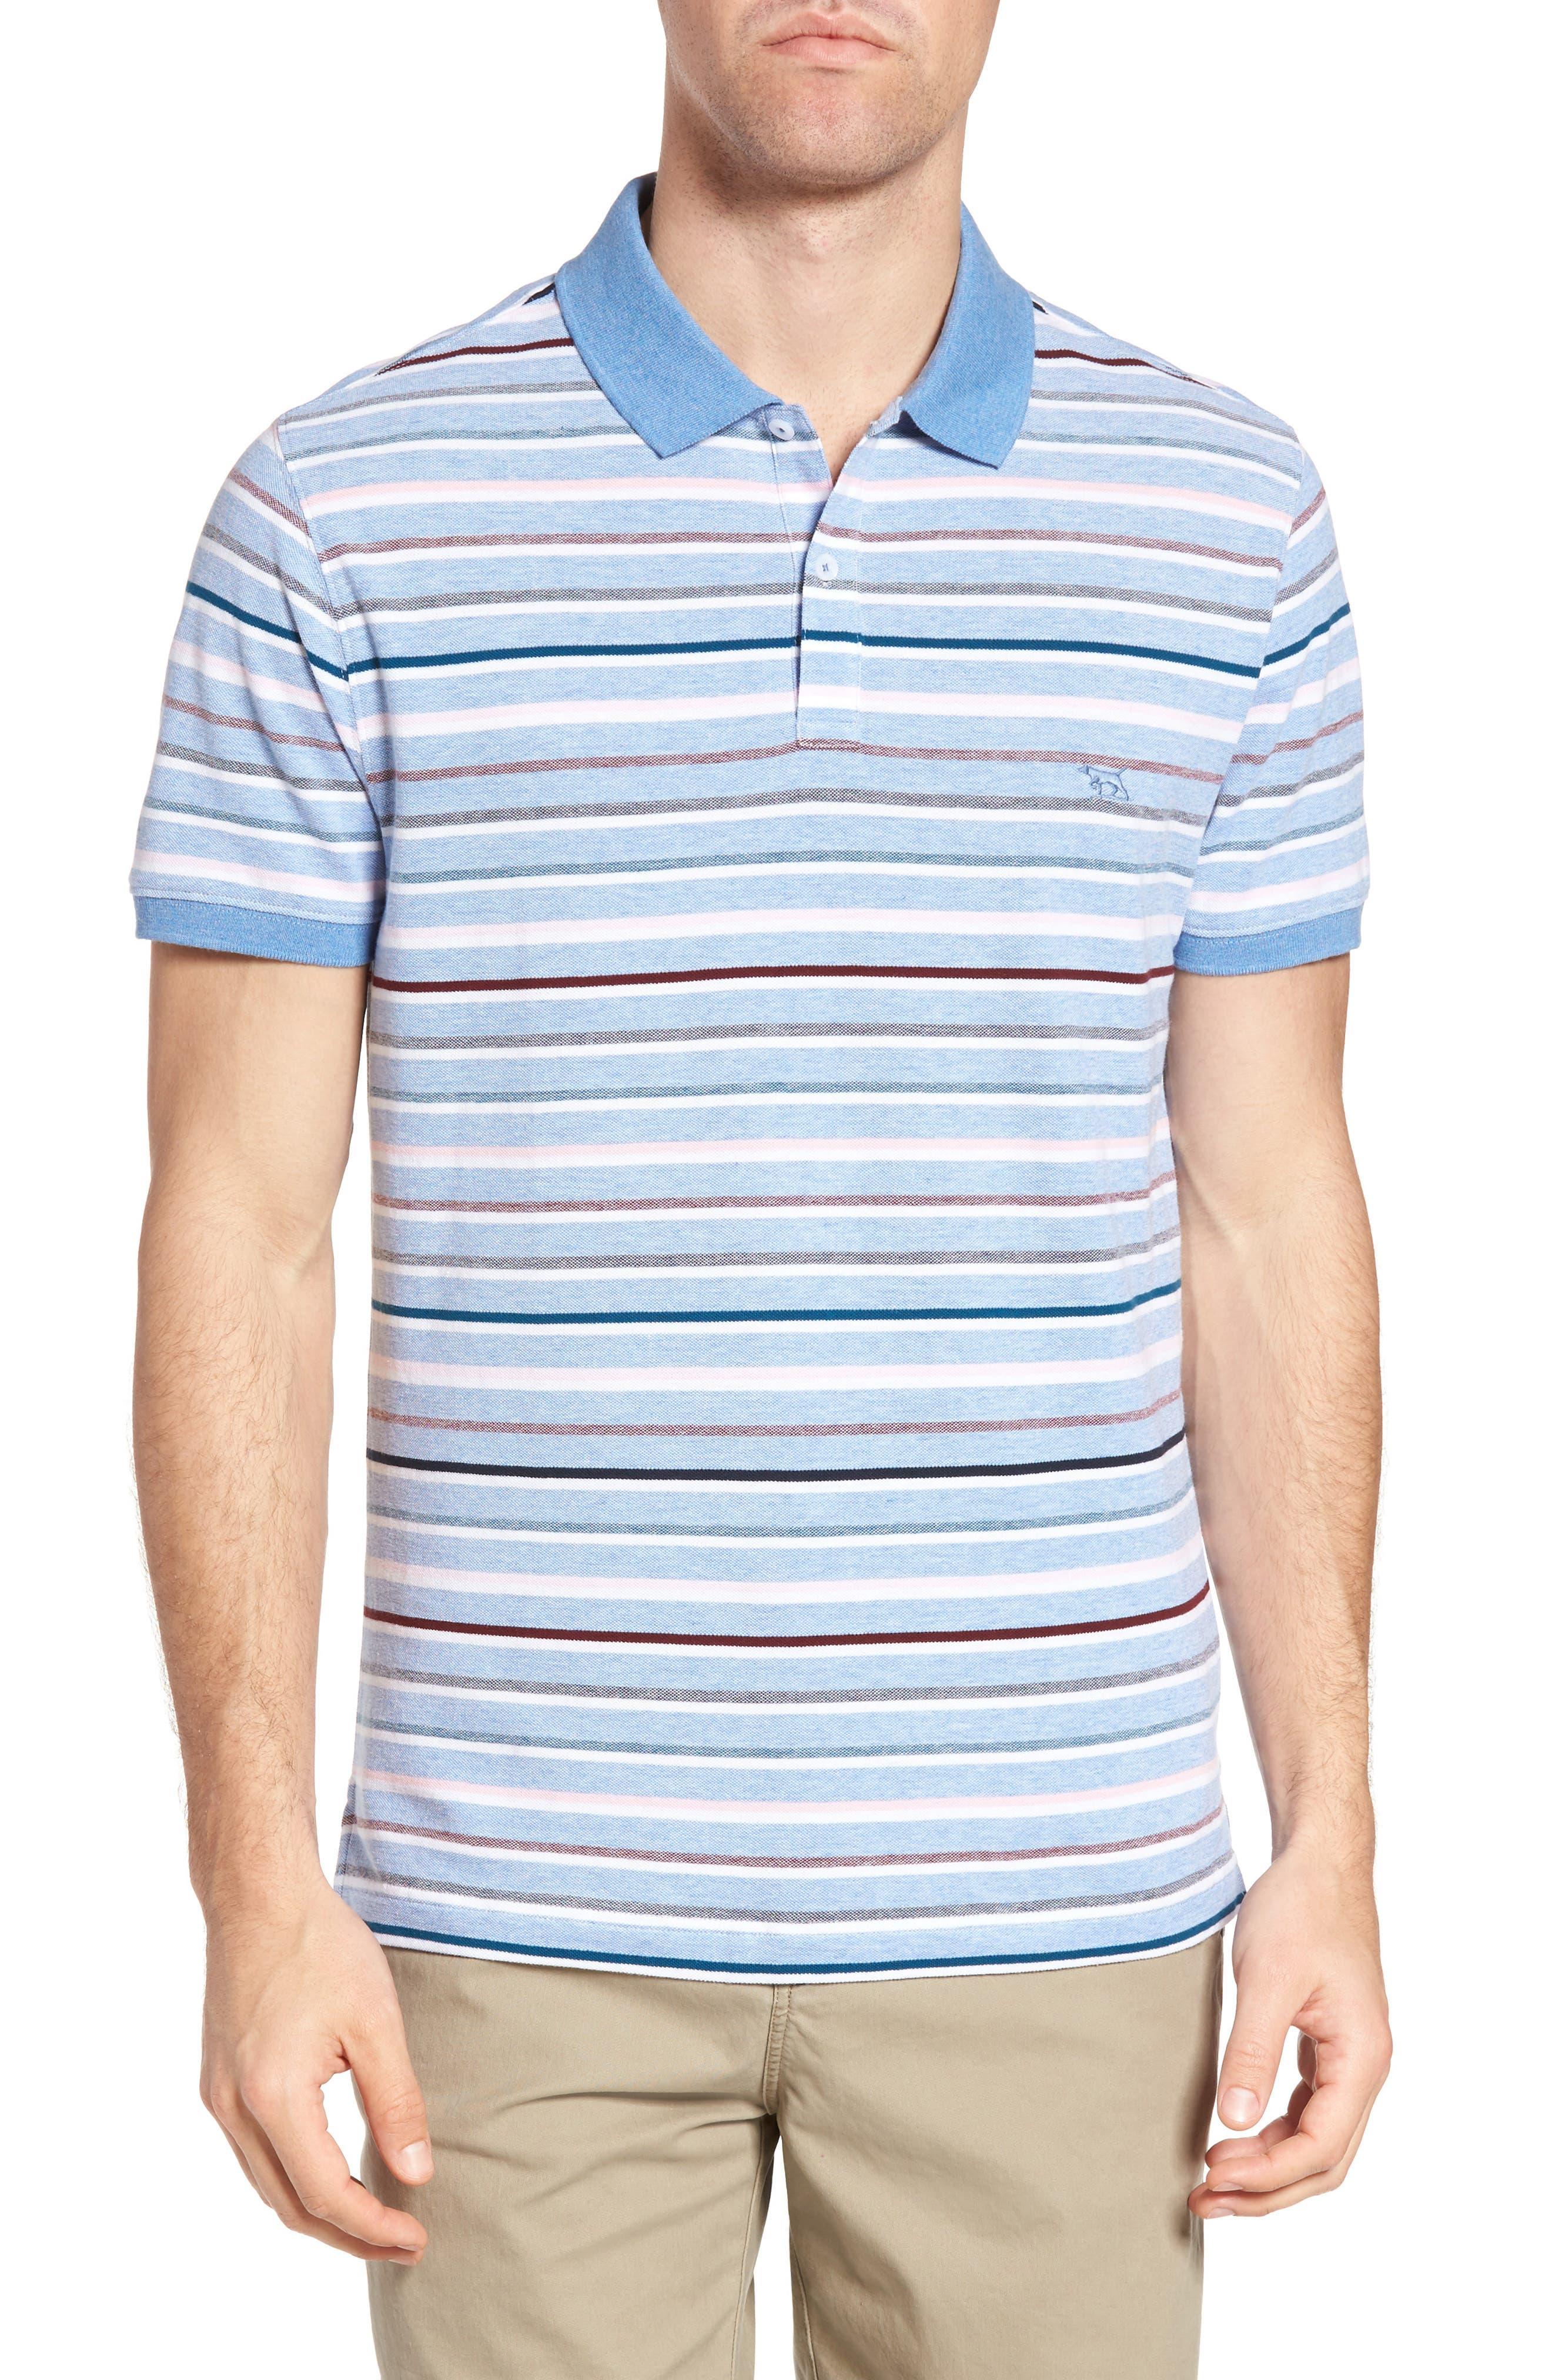 Gowan Hill Sports Fit Cotton Polo,                             Main thumbnail 1, color,                             457